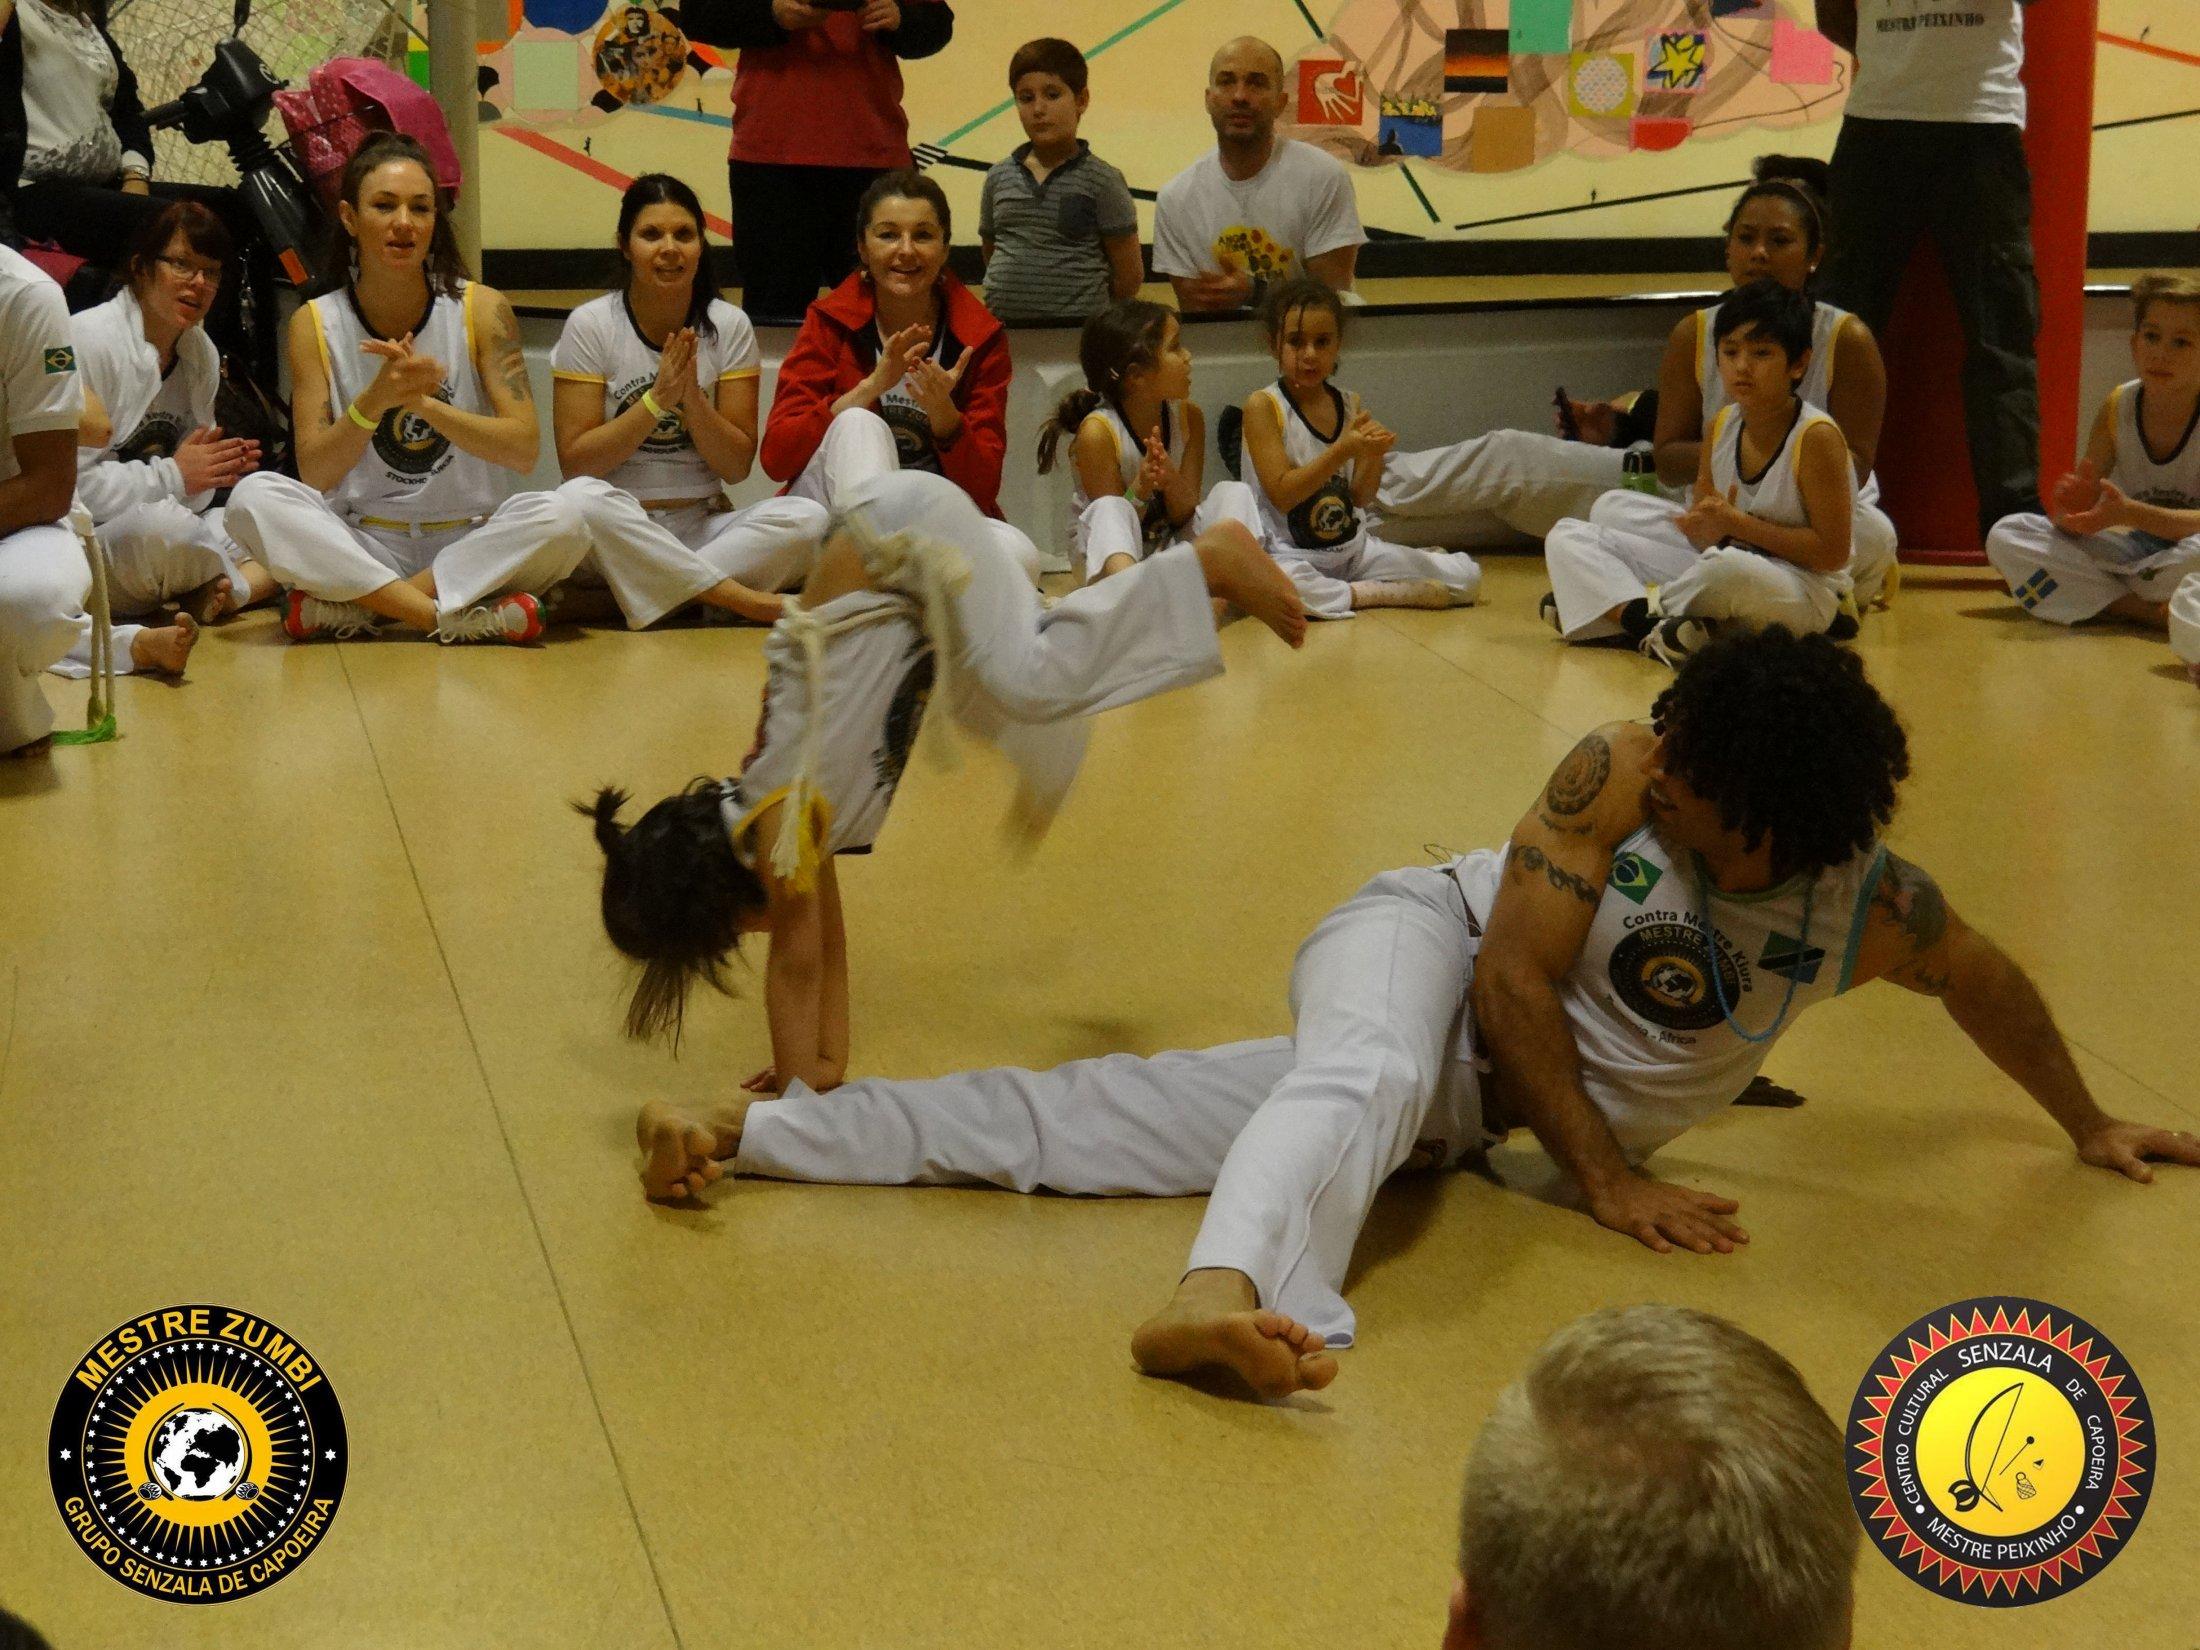 2013-12-14 - Capoeira 066